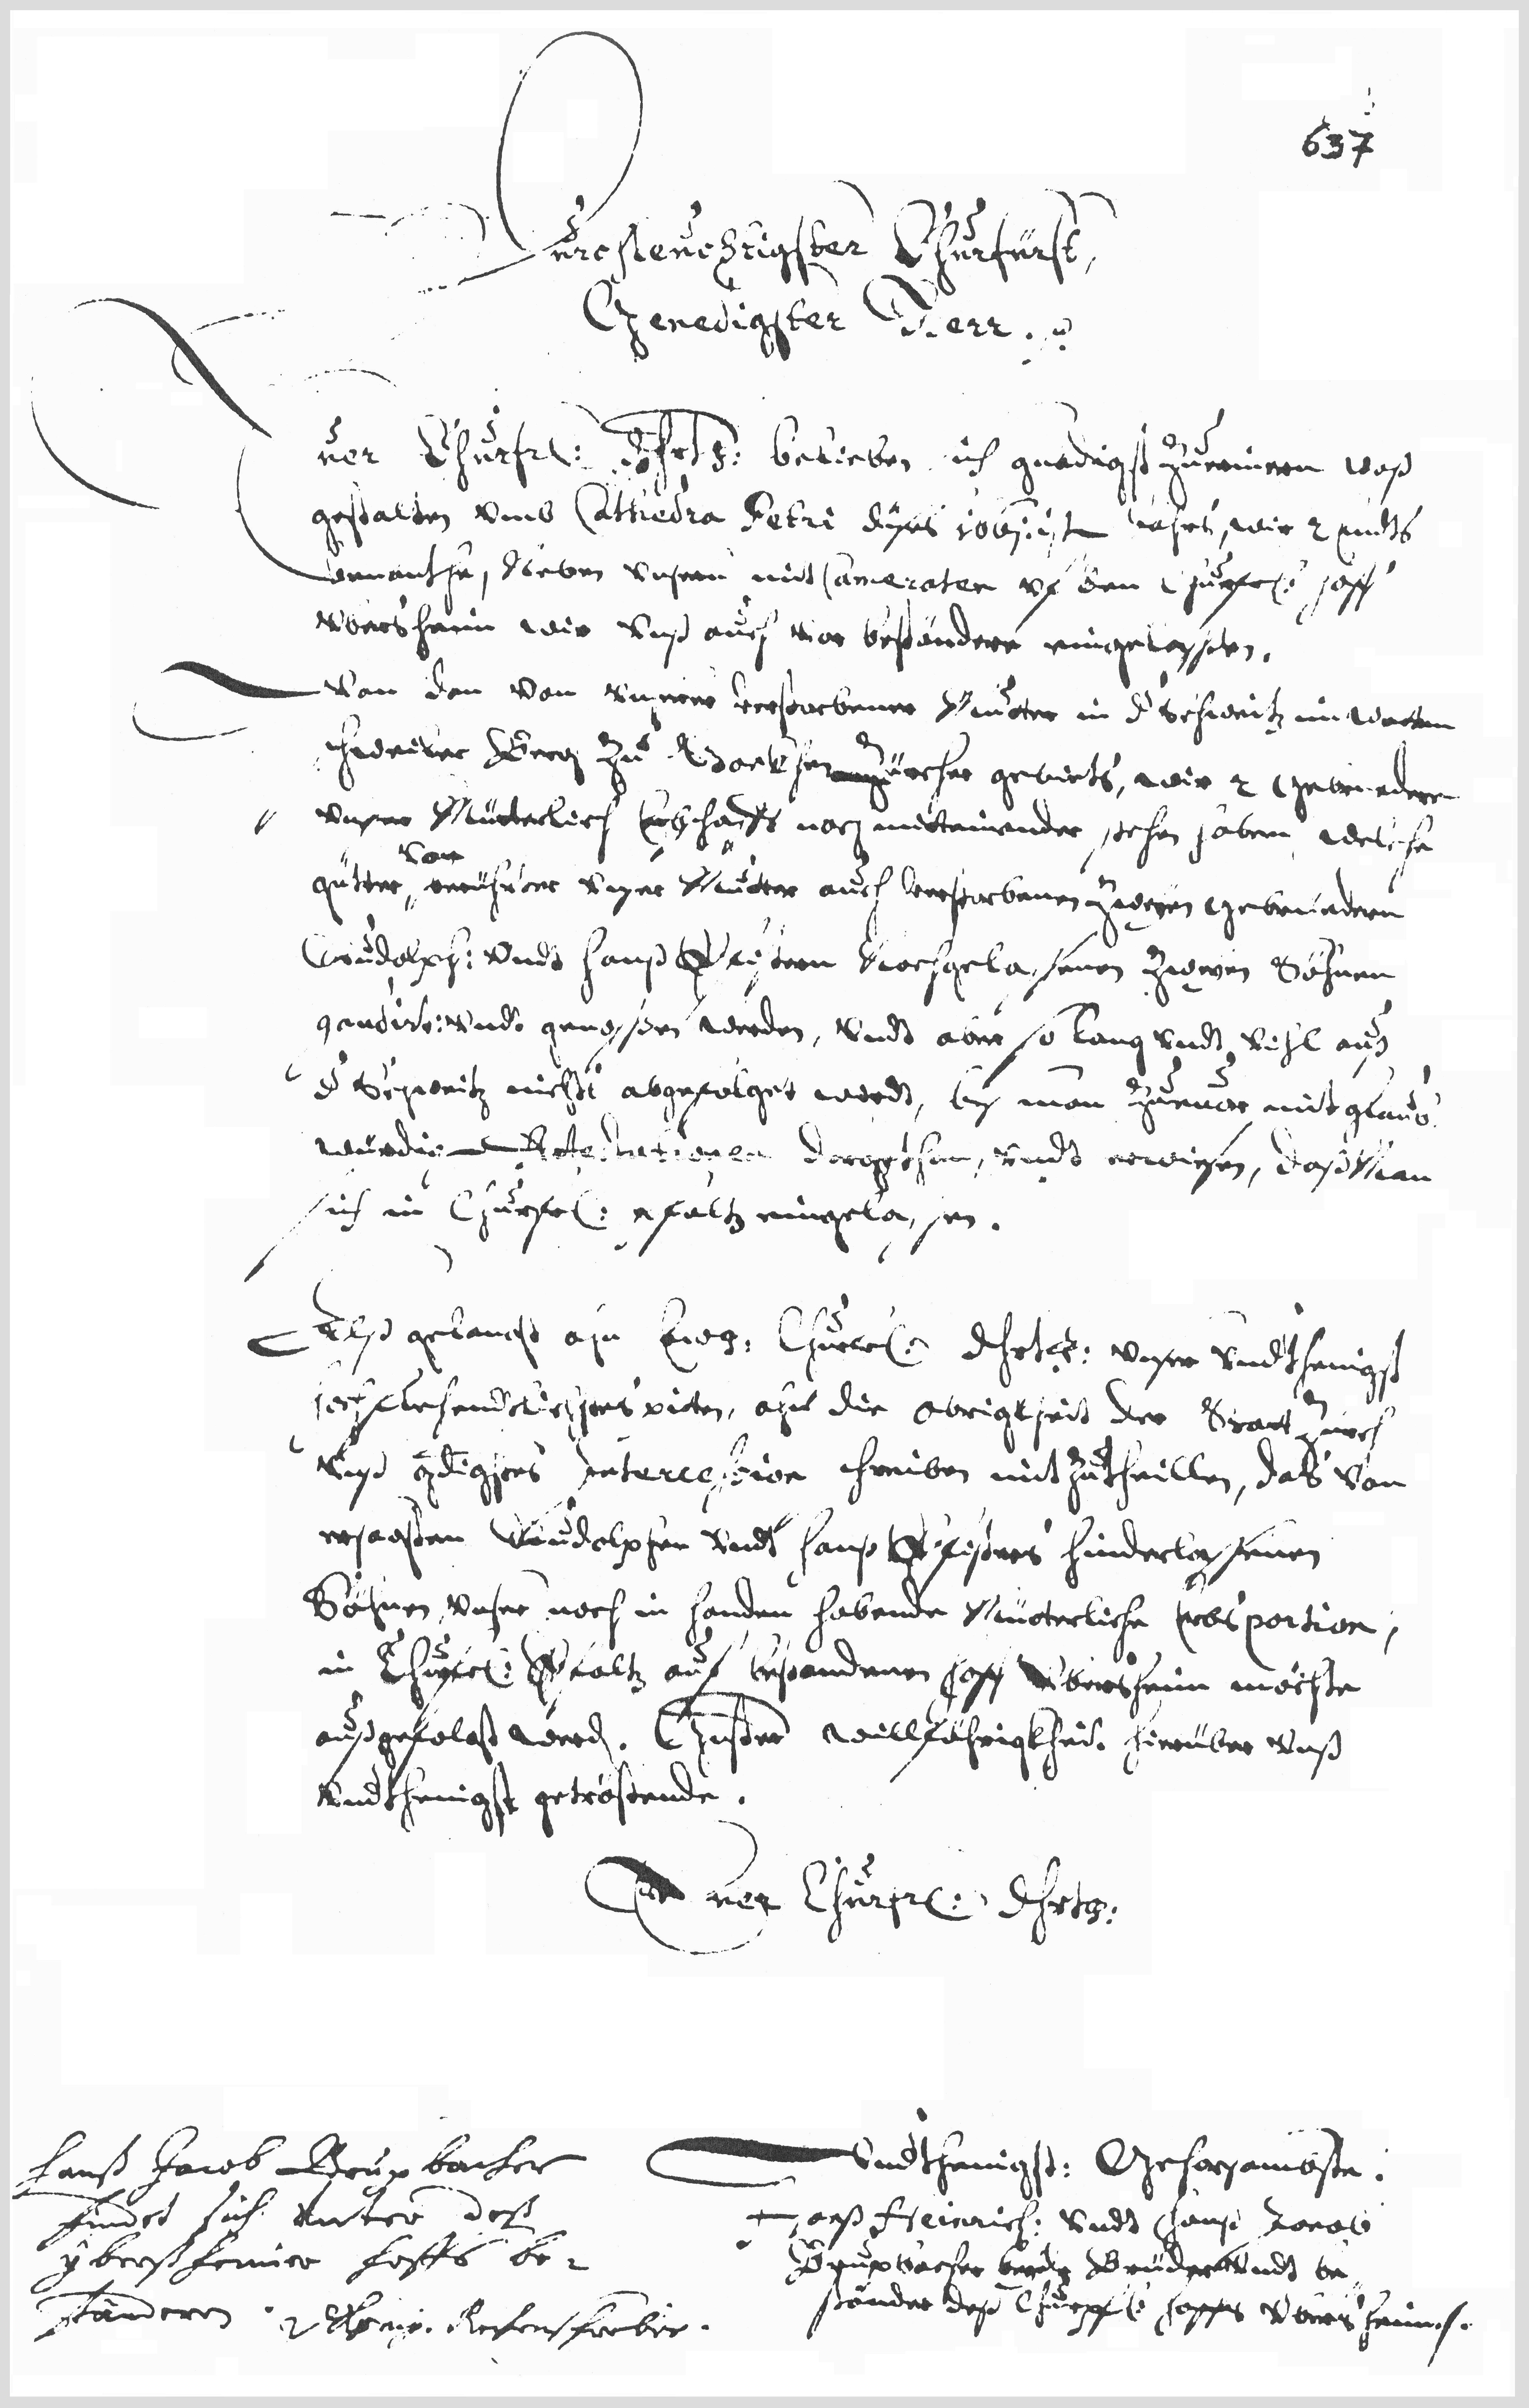 Demand letter, 1661